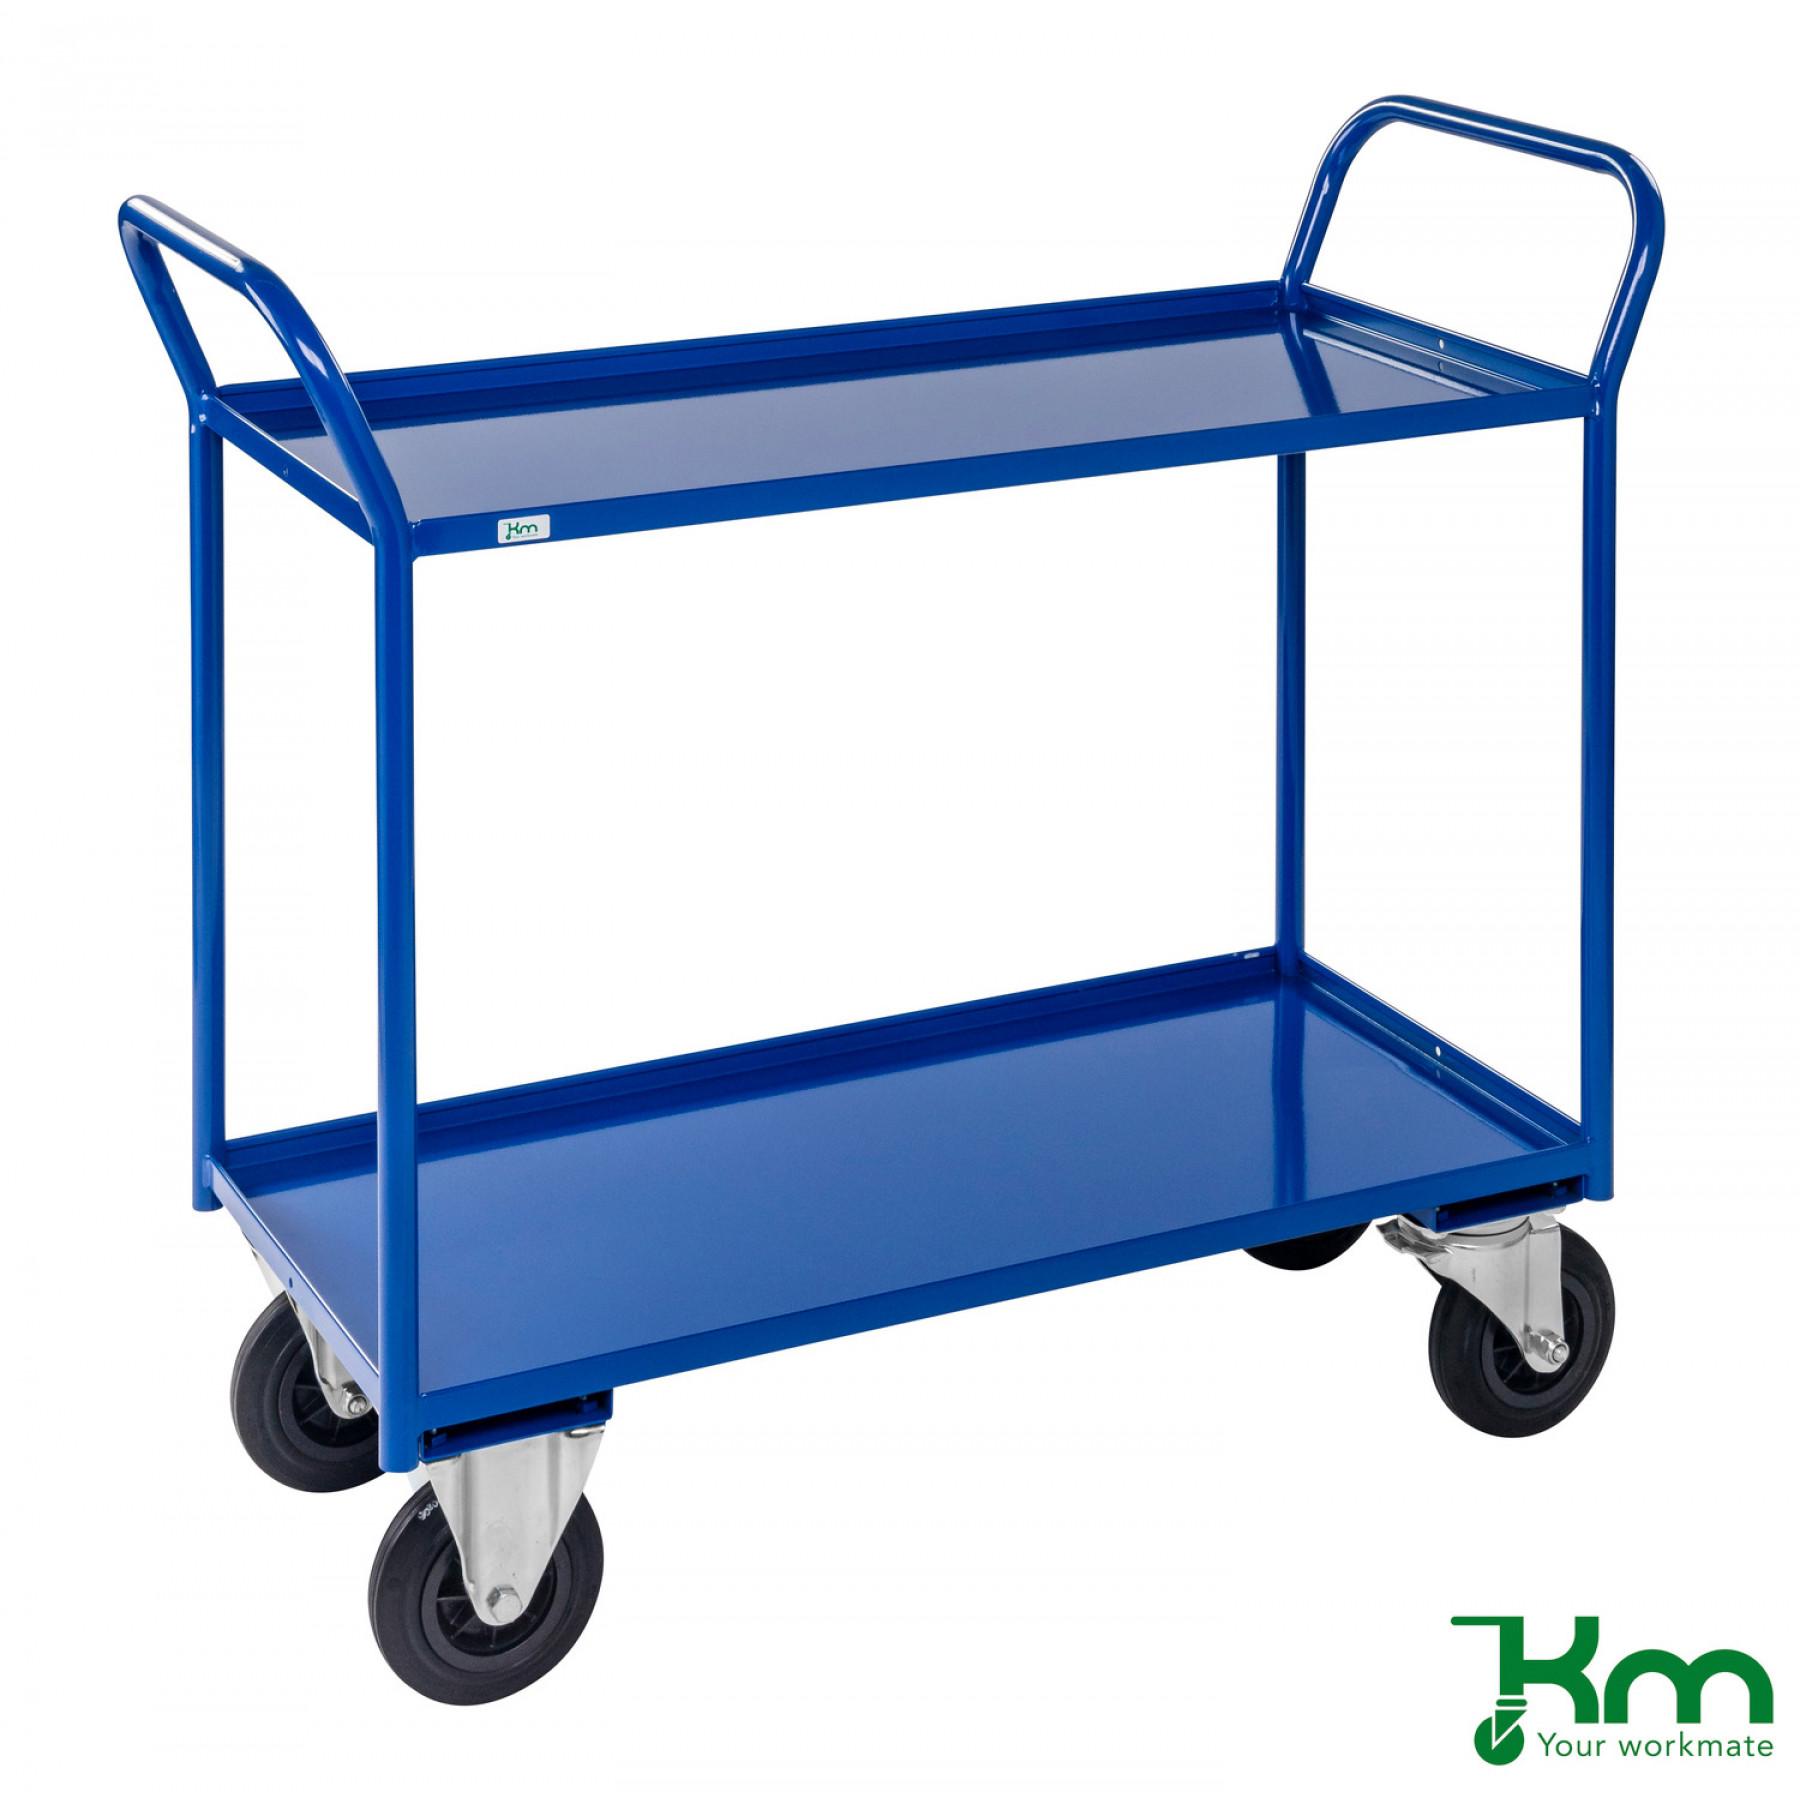 KM tafelwagen 1080x450 mm, KM 4133-BB